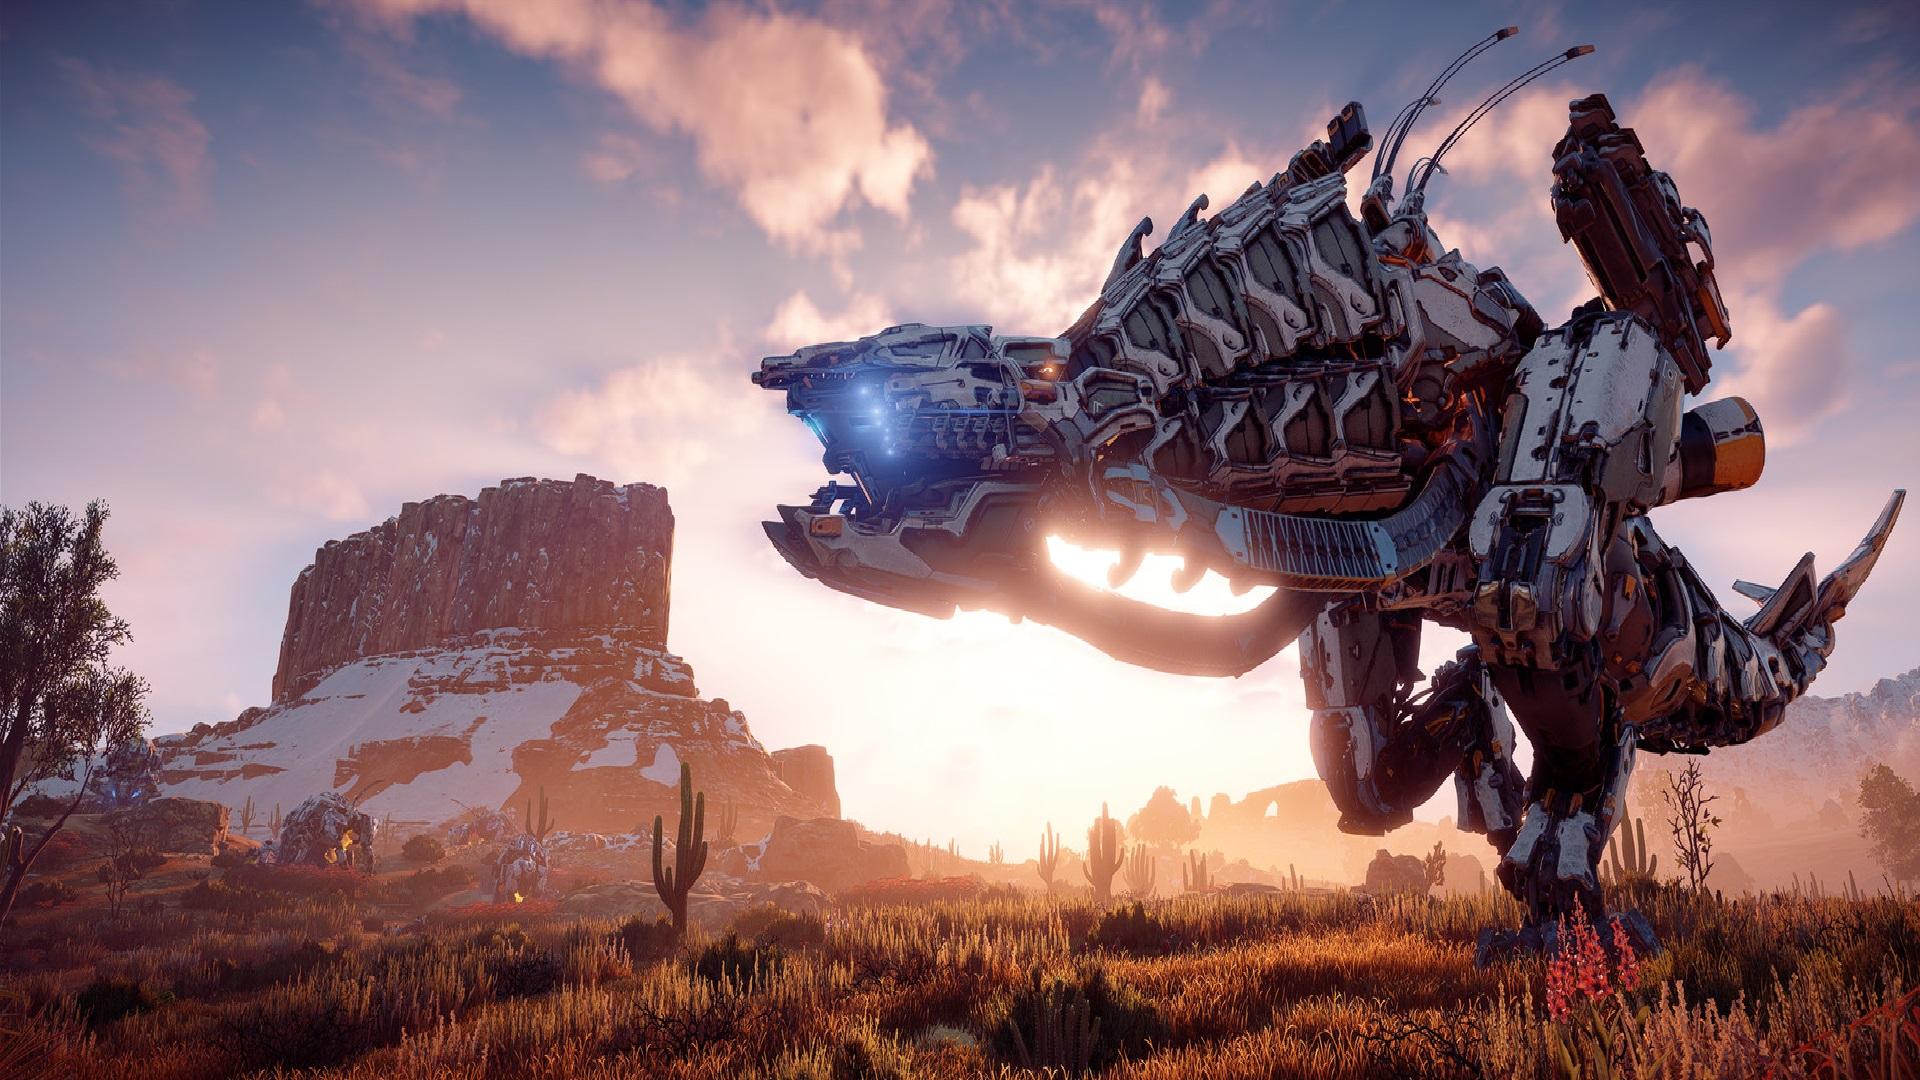 Content Drop August 2020 Pc Game Releases Horizon Zero Dawn Total War Saga Troy Risk Of Rain 2 Wasteland 3 Microsoft Flight Simulator 1